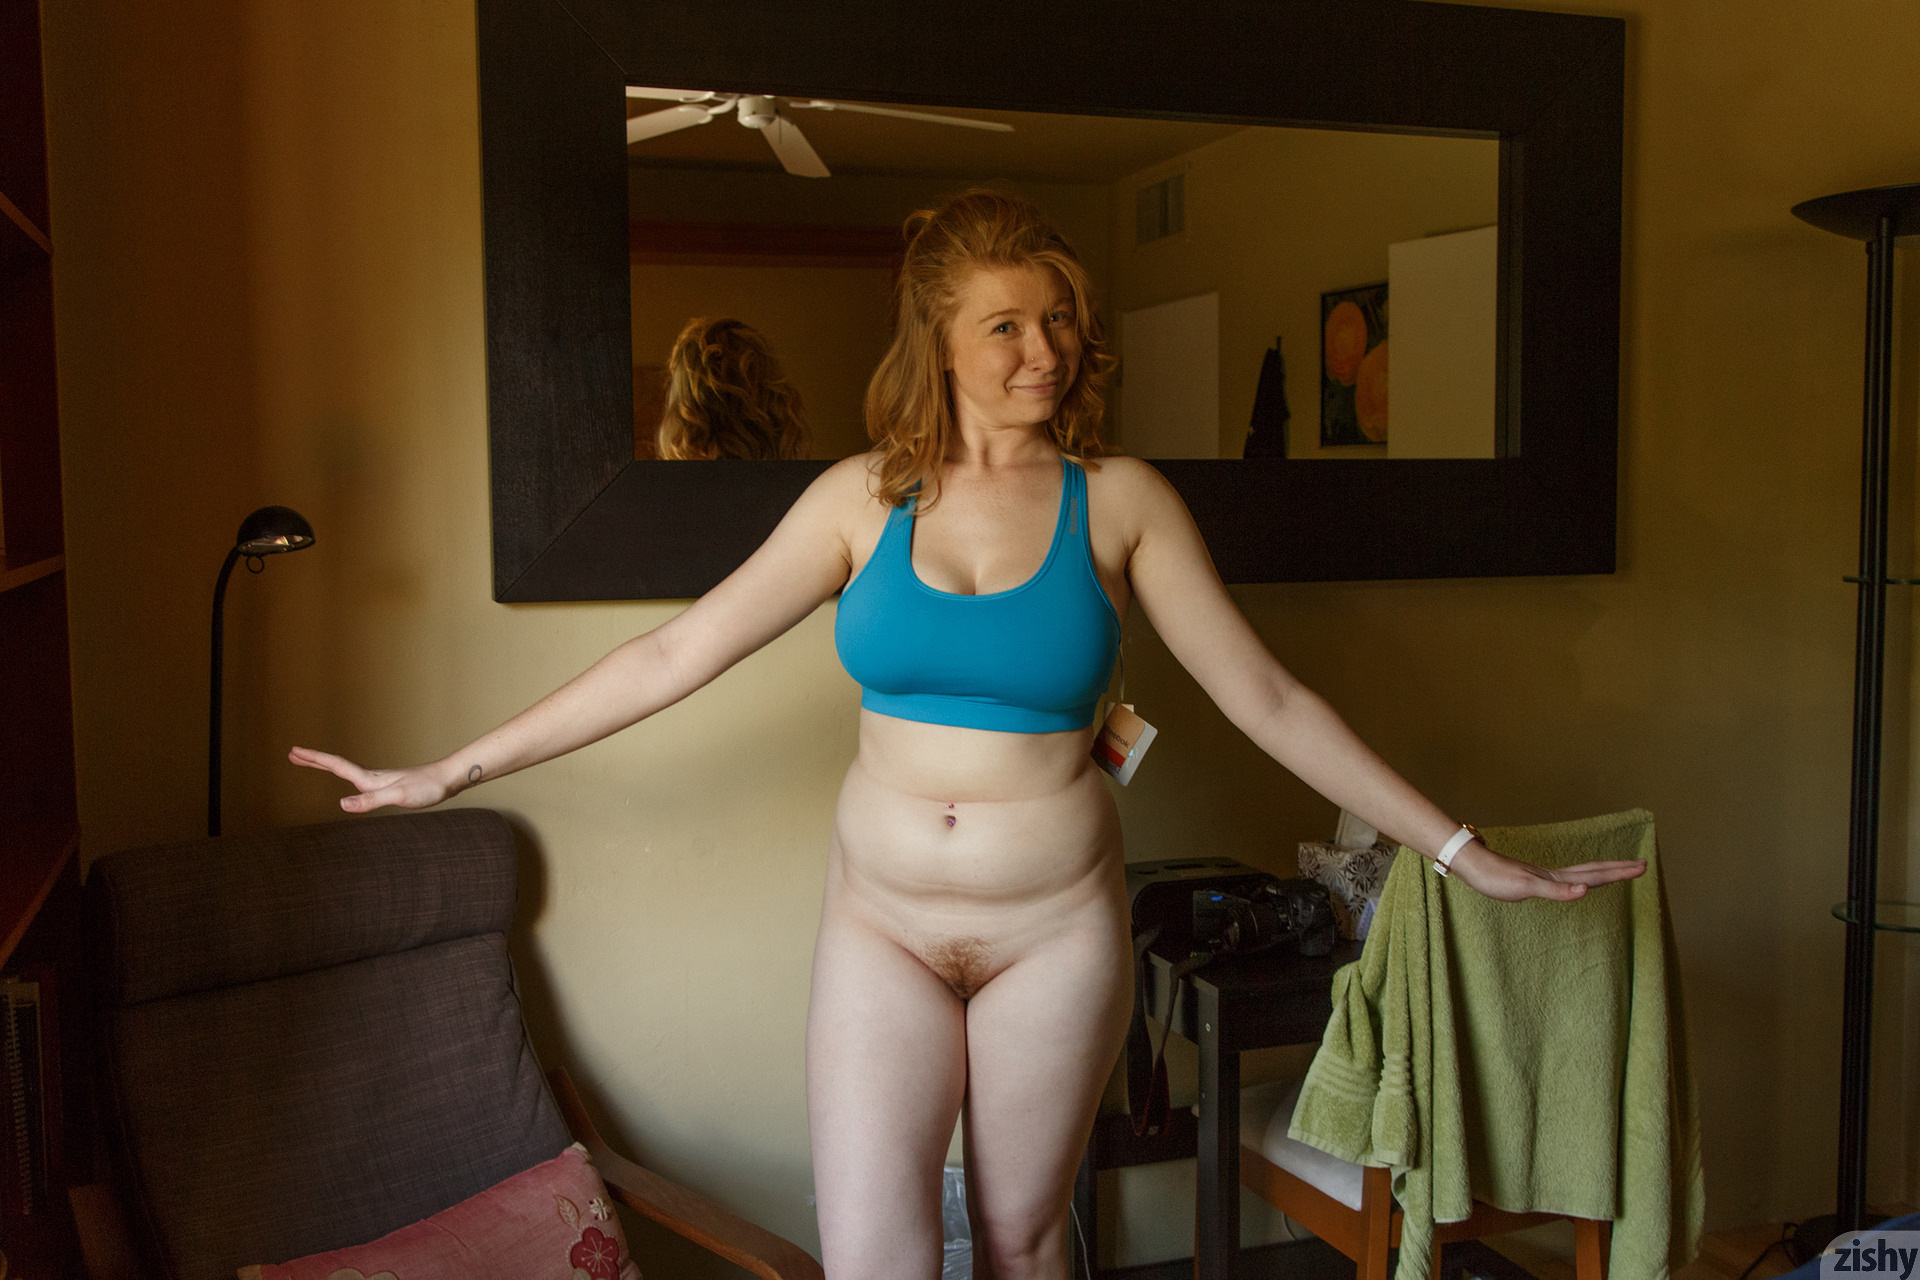 Irelynn Dunham Shake And Bake Zishy (4)